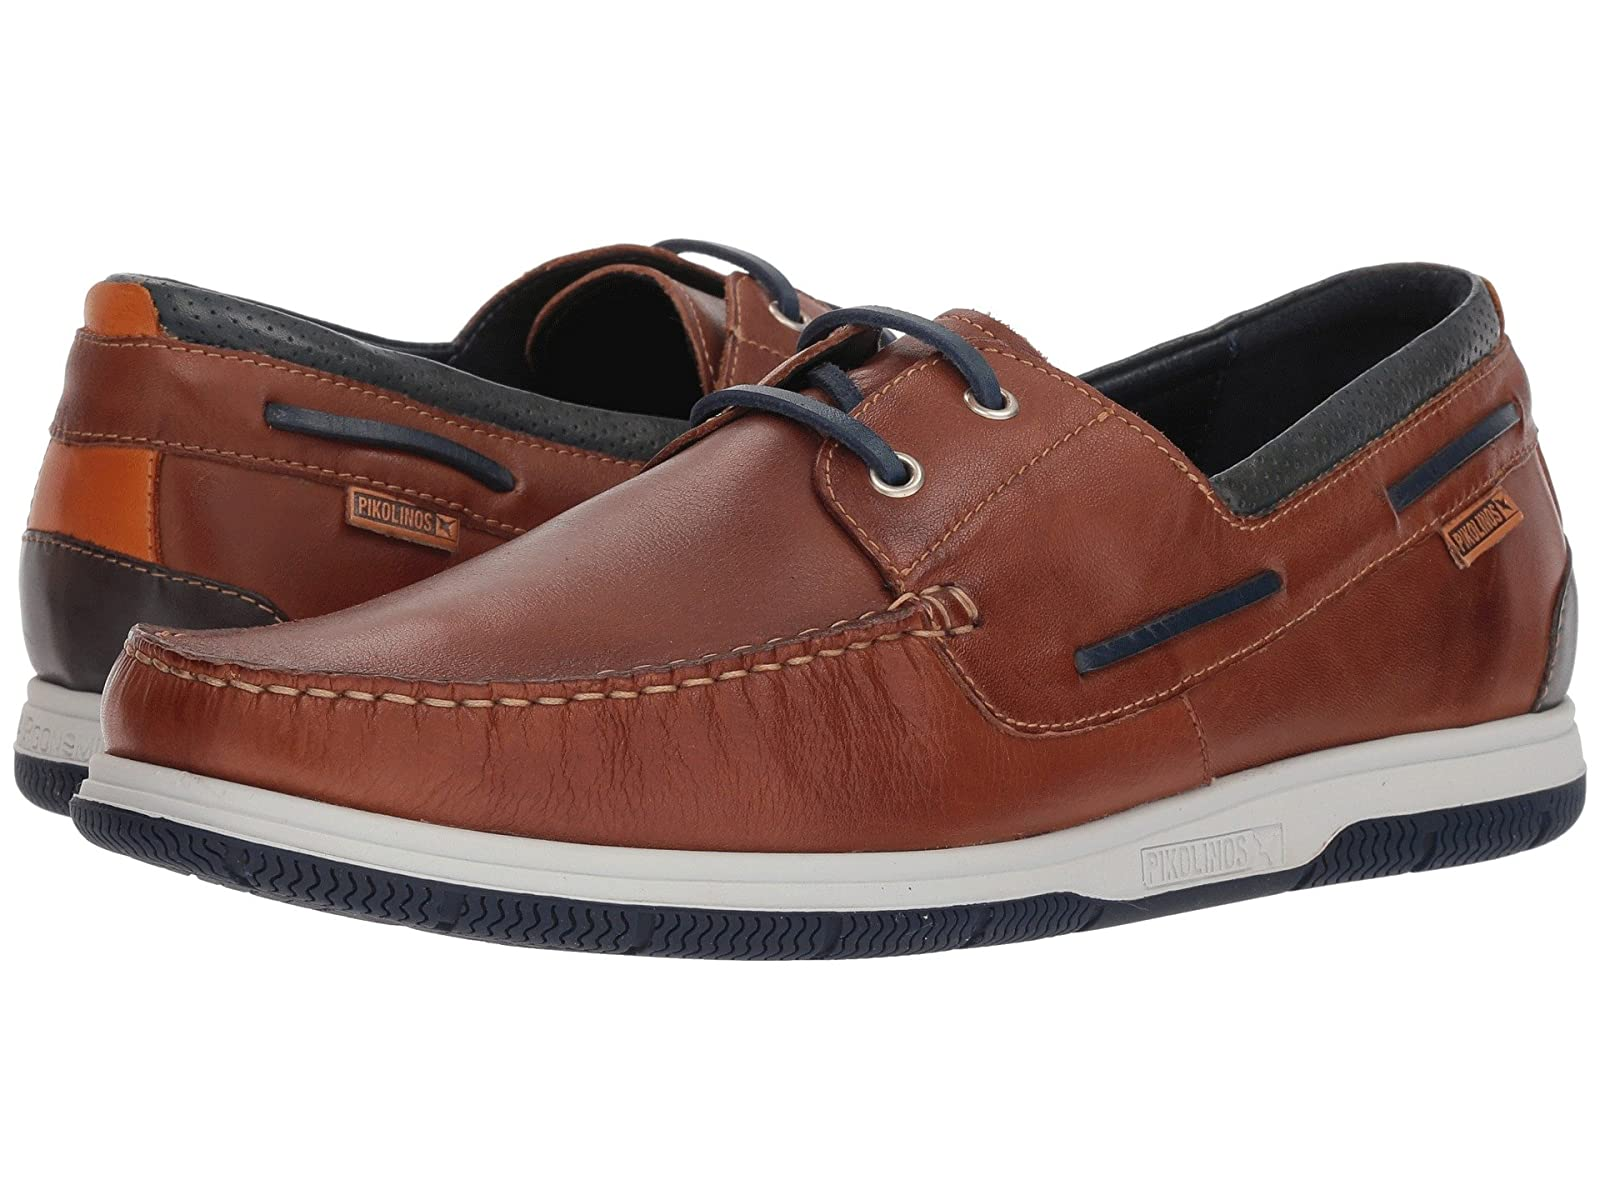 Pikolinos Almeria 08L-1020Atmospheric grades have affordable shoes